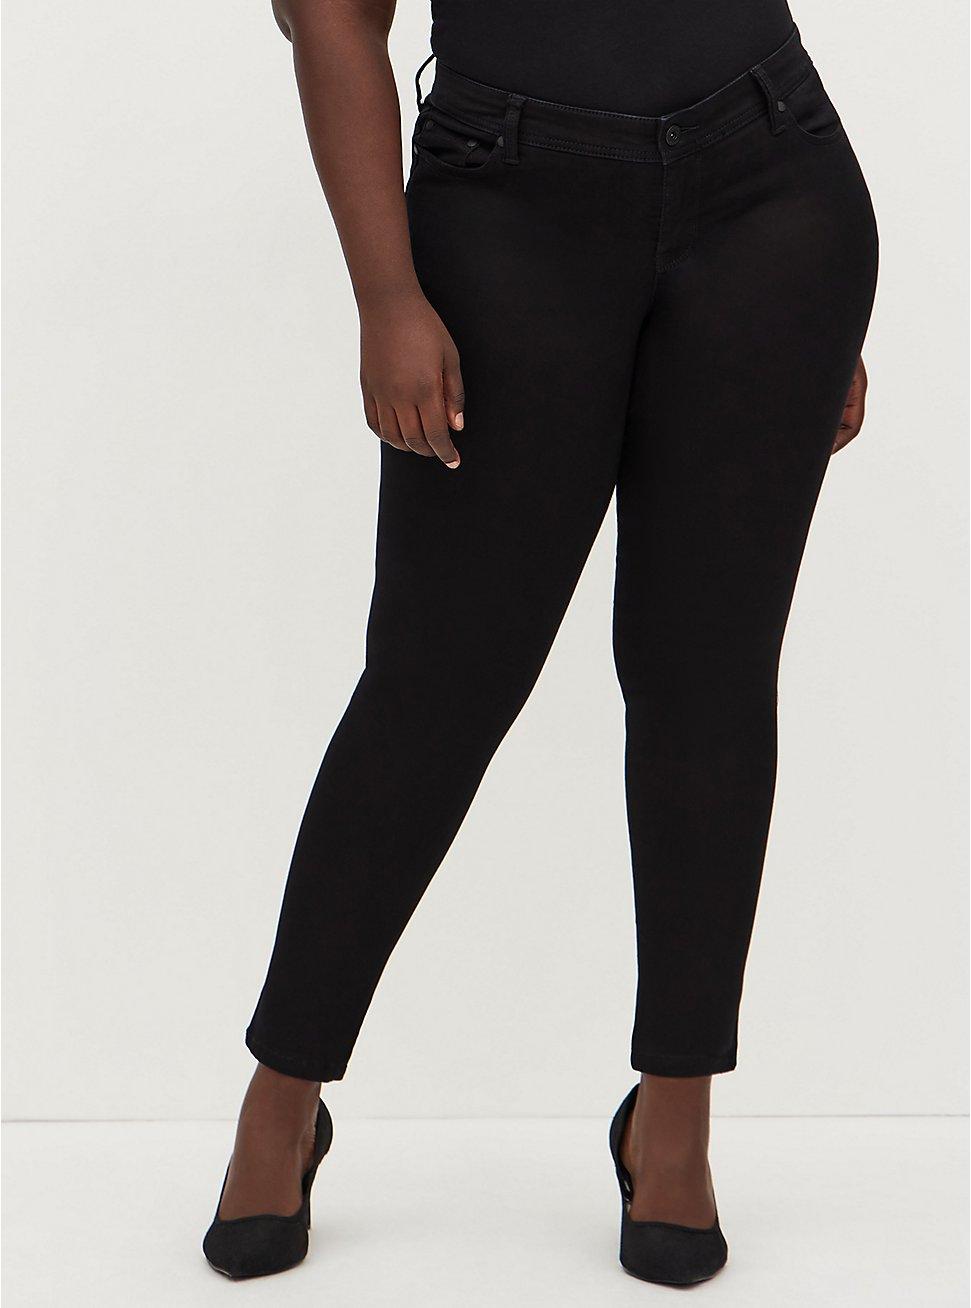 Luxe Skinny Jean - Sateen Stretch Black, , fitModel1-hires